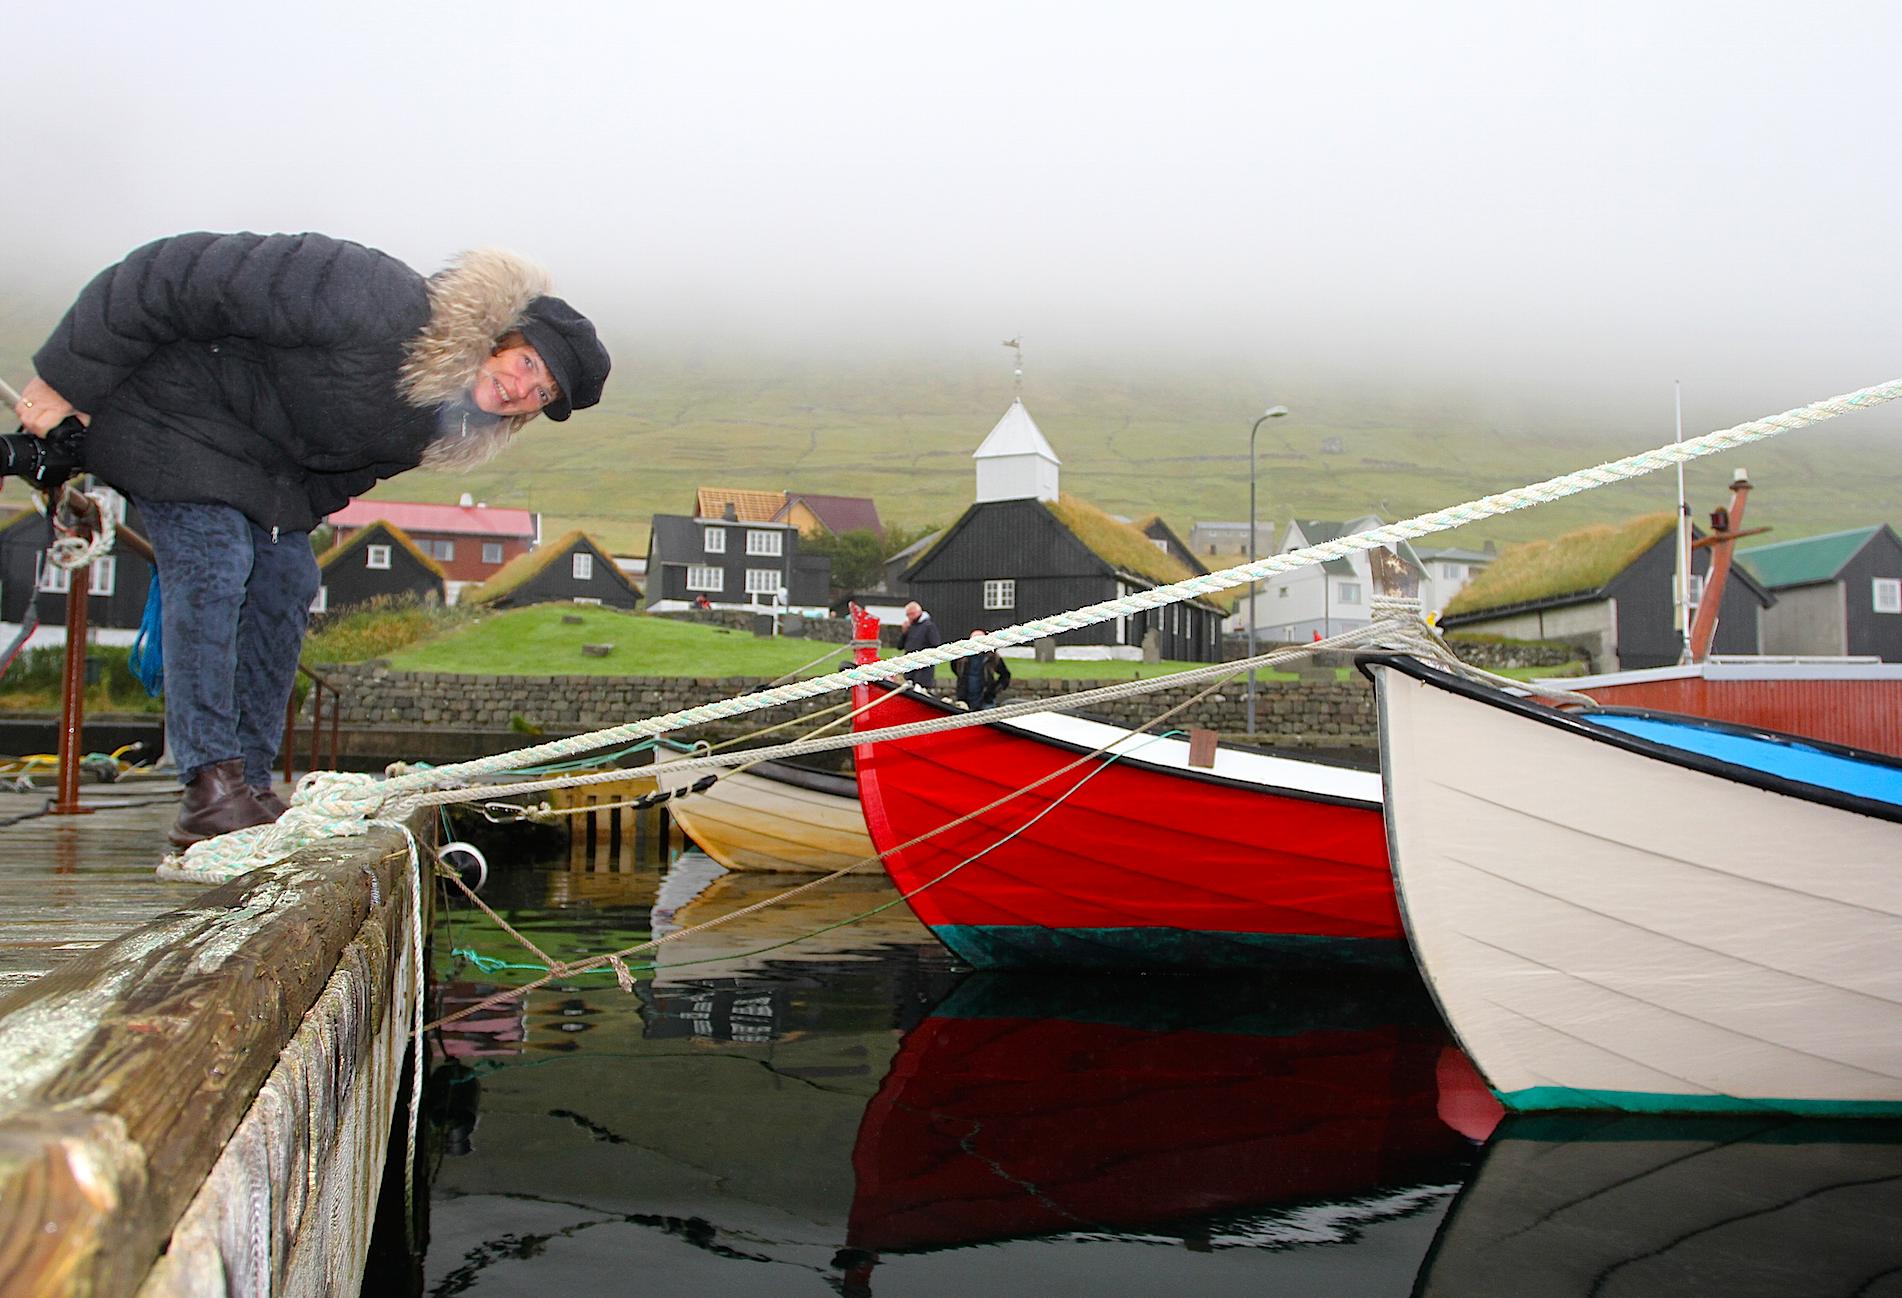 Havnen i bygda Gøta, som var hjembygd til Tróndur, en hedensk vikinghøvding som styrte hele Færøyene i en periode.